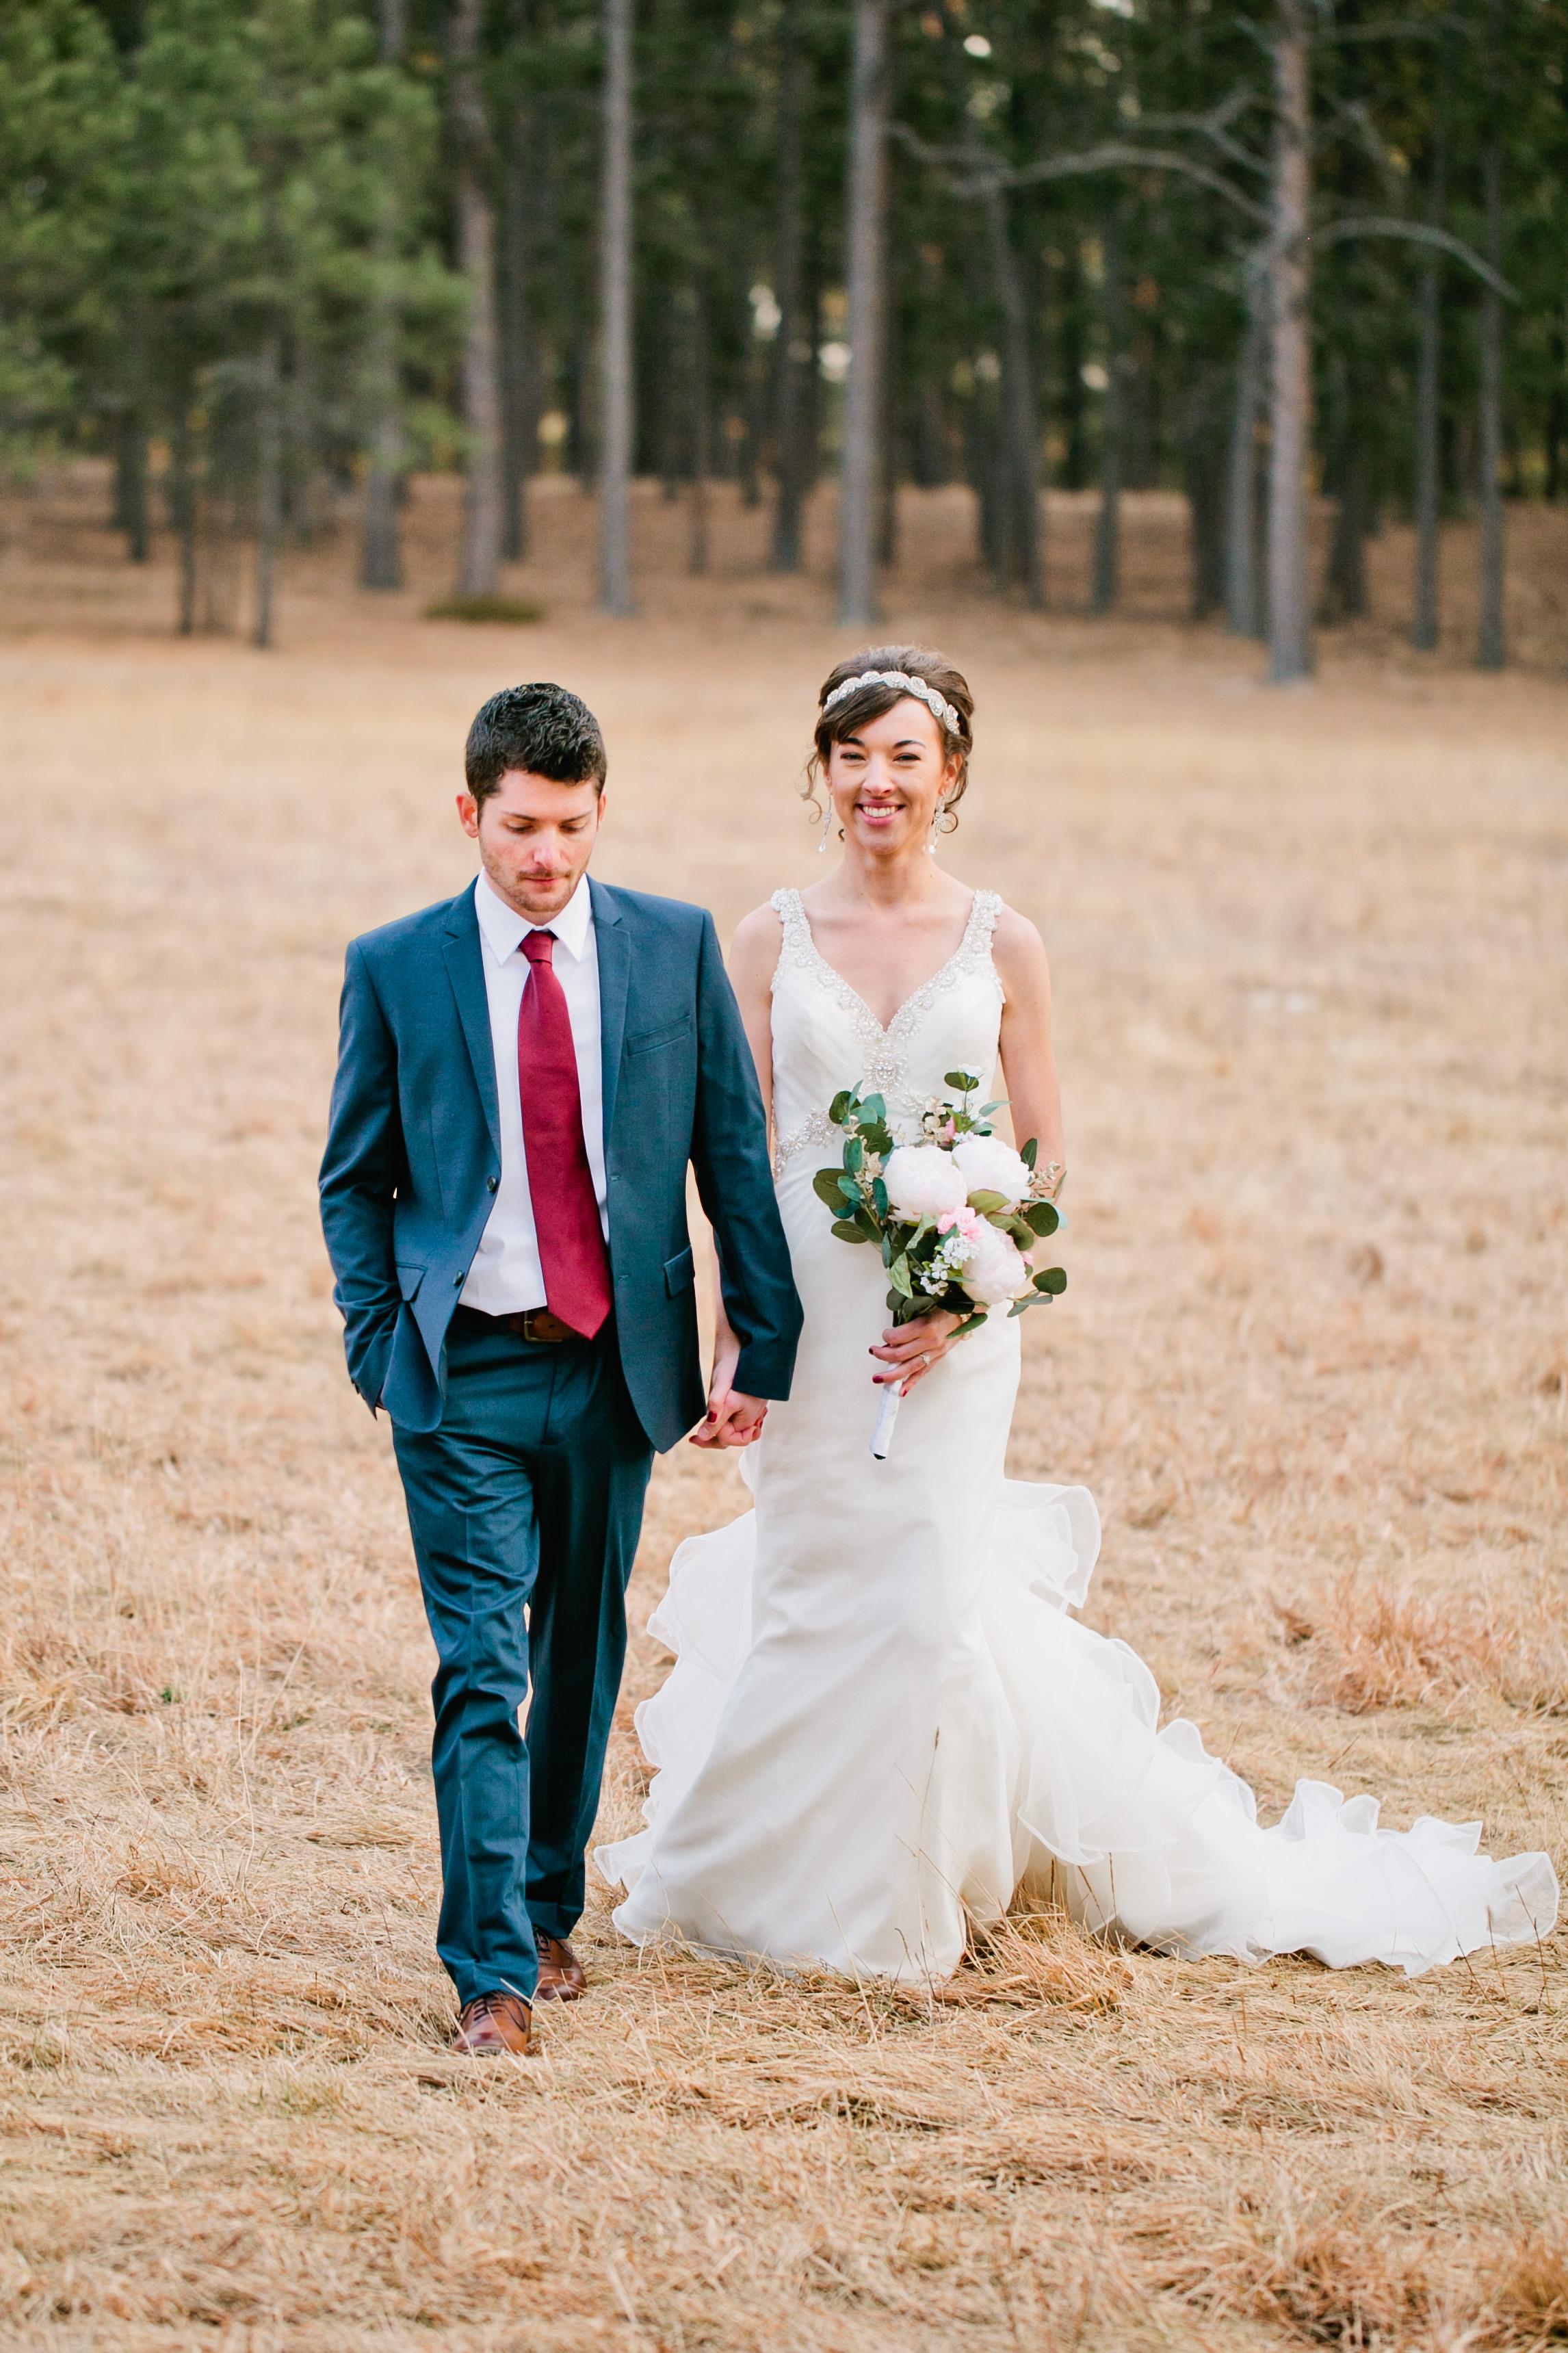 theknot.com wedding photographers in Des Moines Iowa